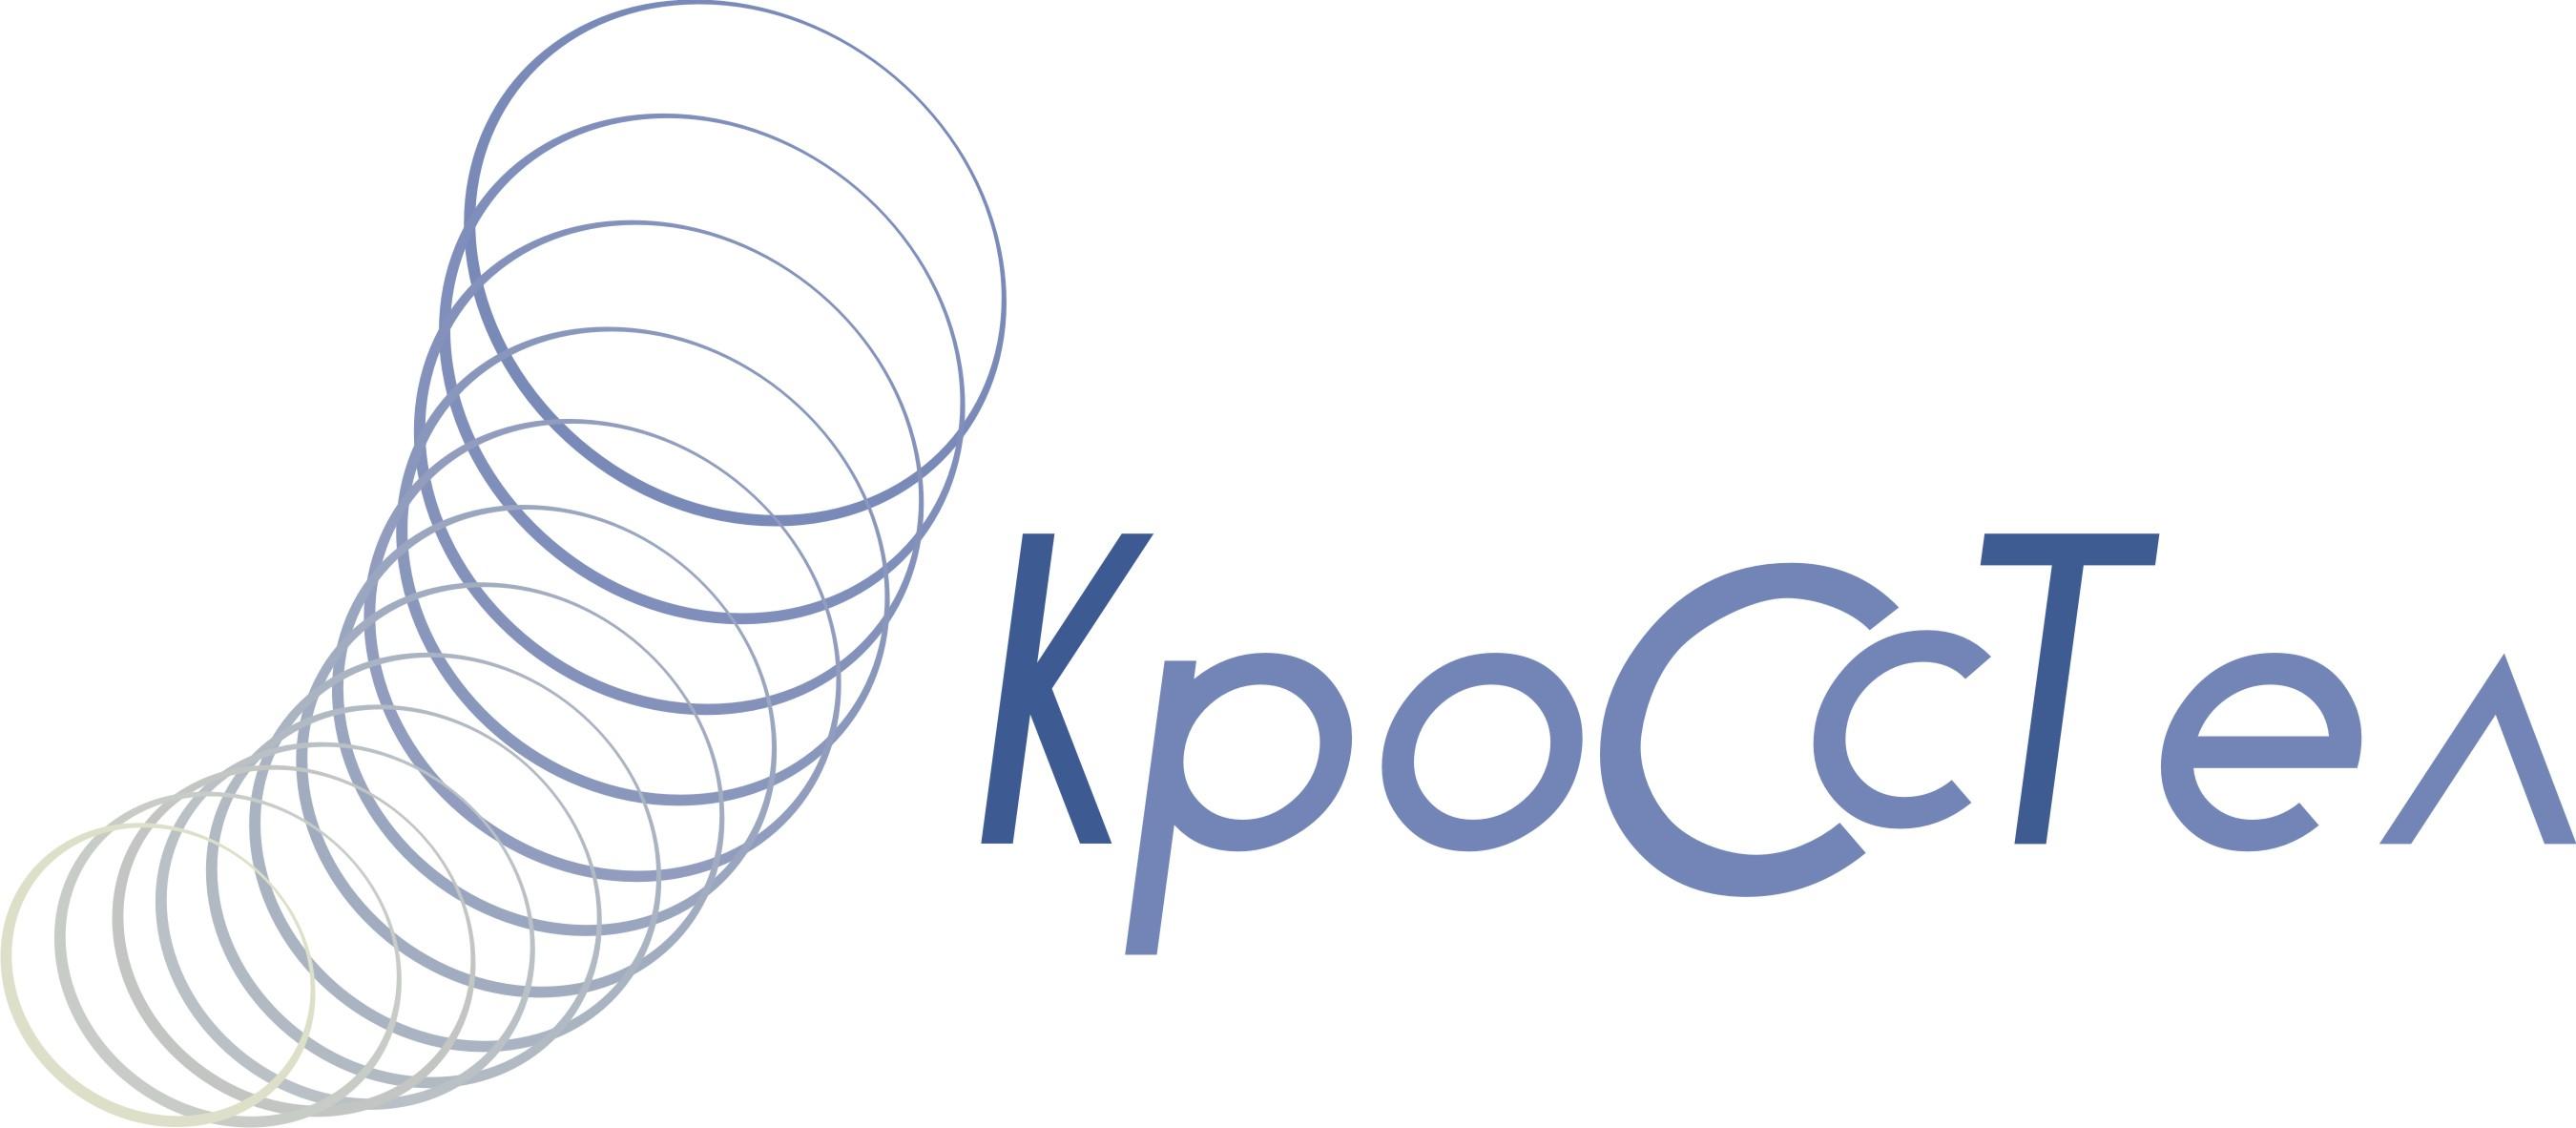 Логотип для компании оператора связи фото f_4ed55a8c5507a.jpg